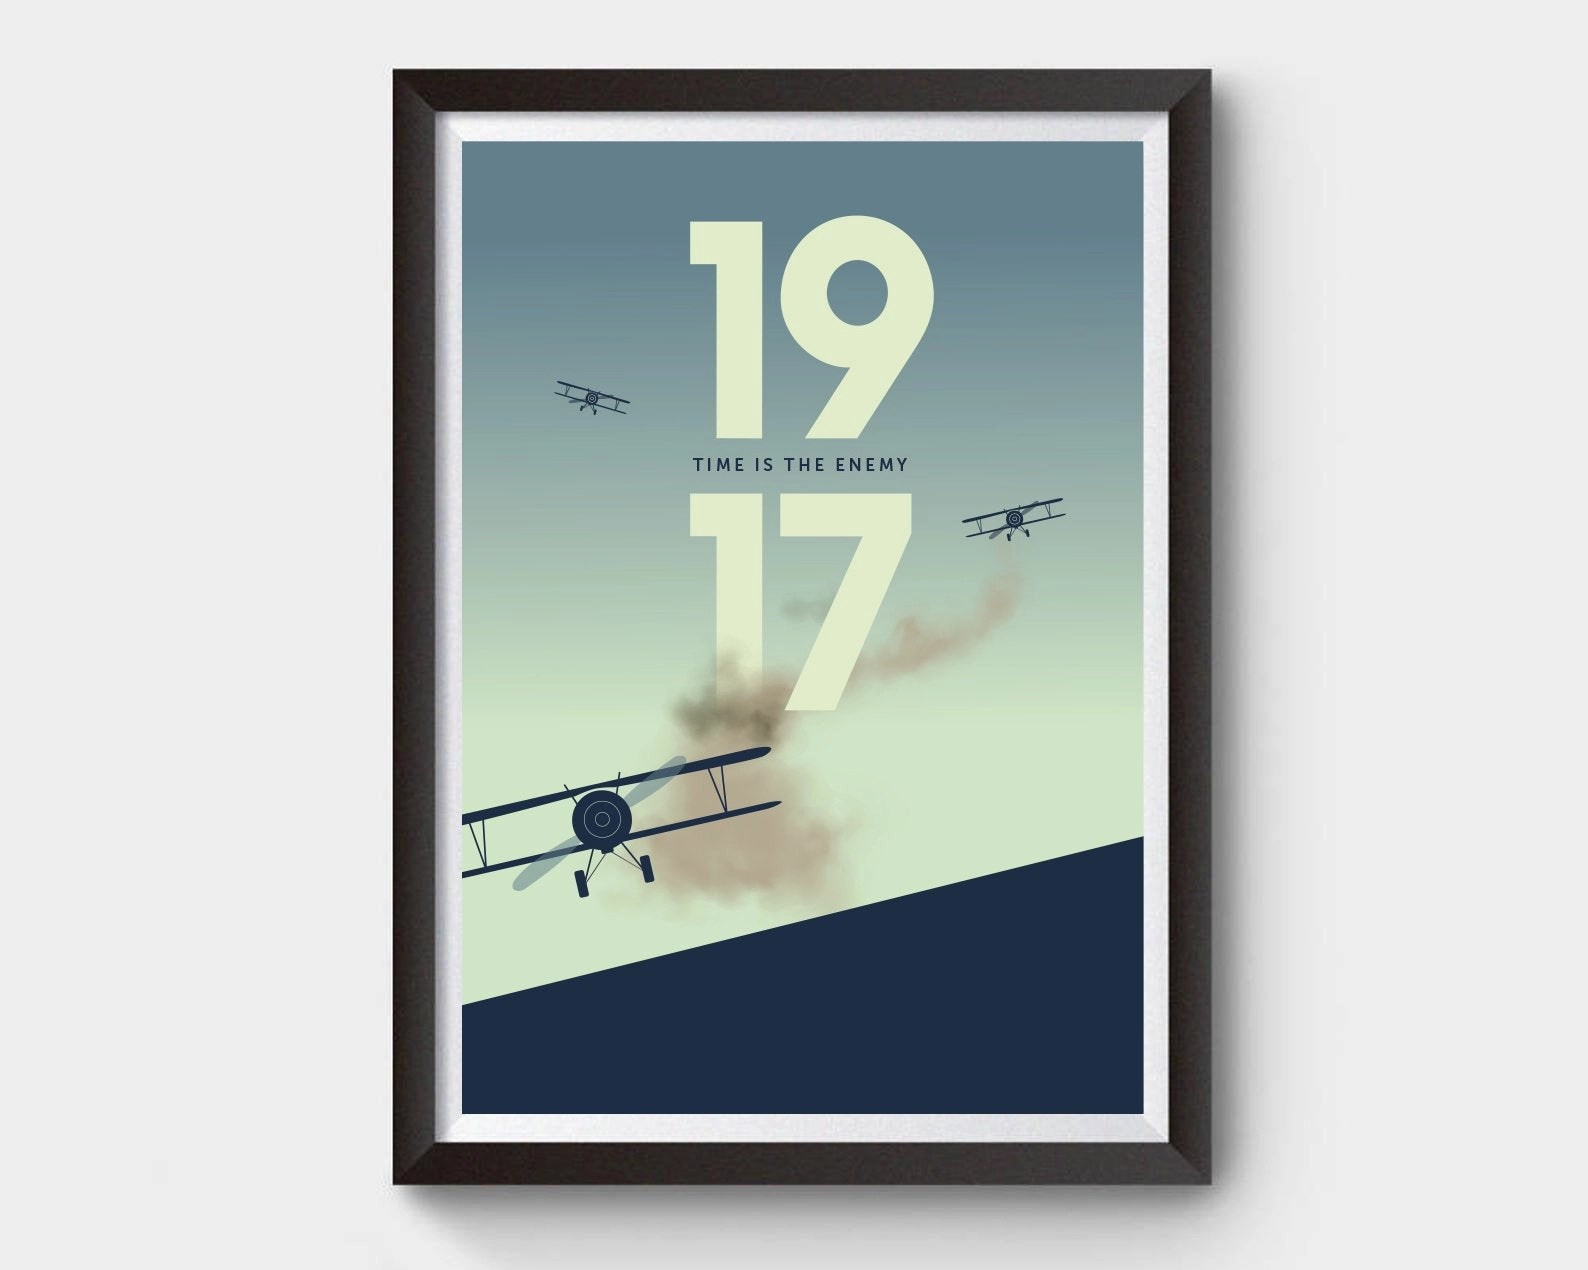 1917 movie poster buy movie posters